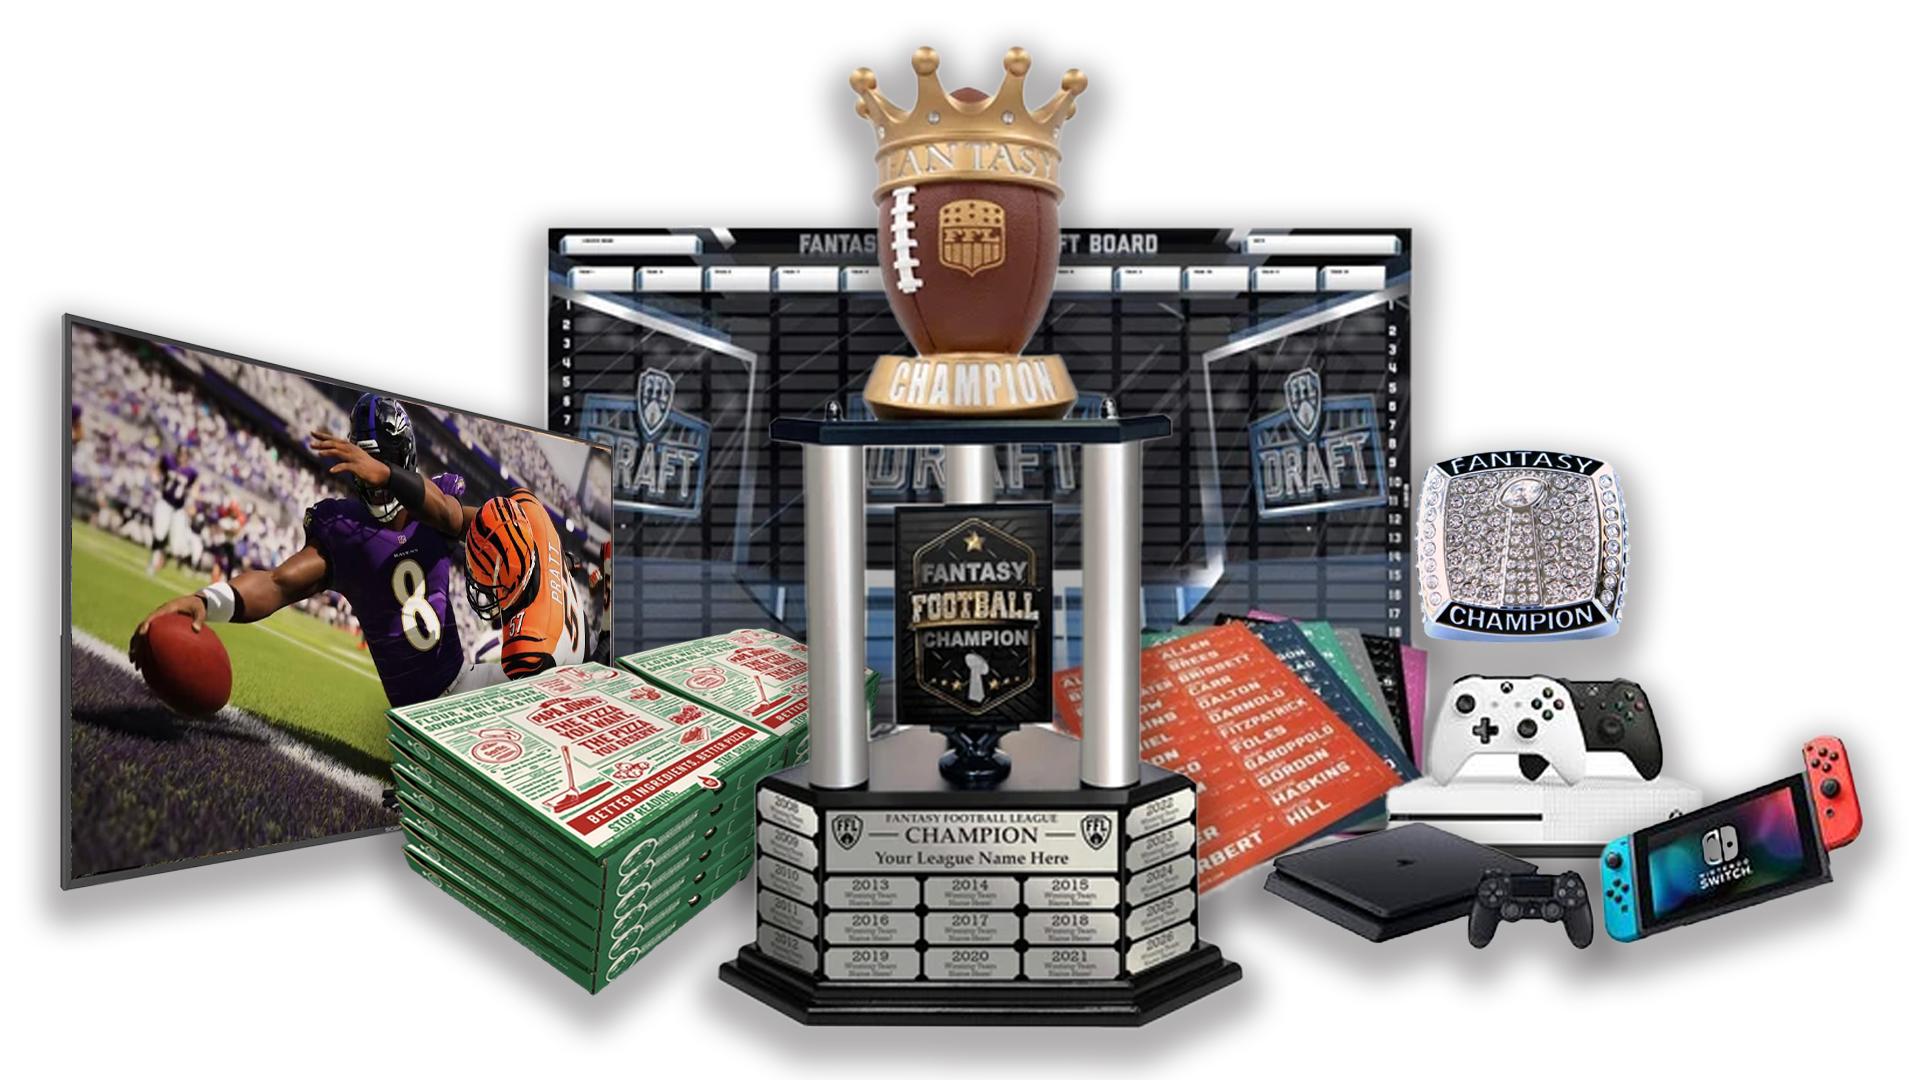 - FFDraft Trophy 2 Pizza2 - Fantasy Football Draft Parties at 1Life2Play